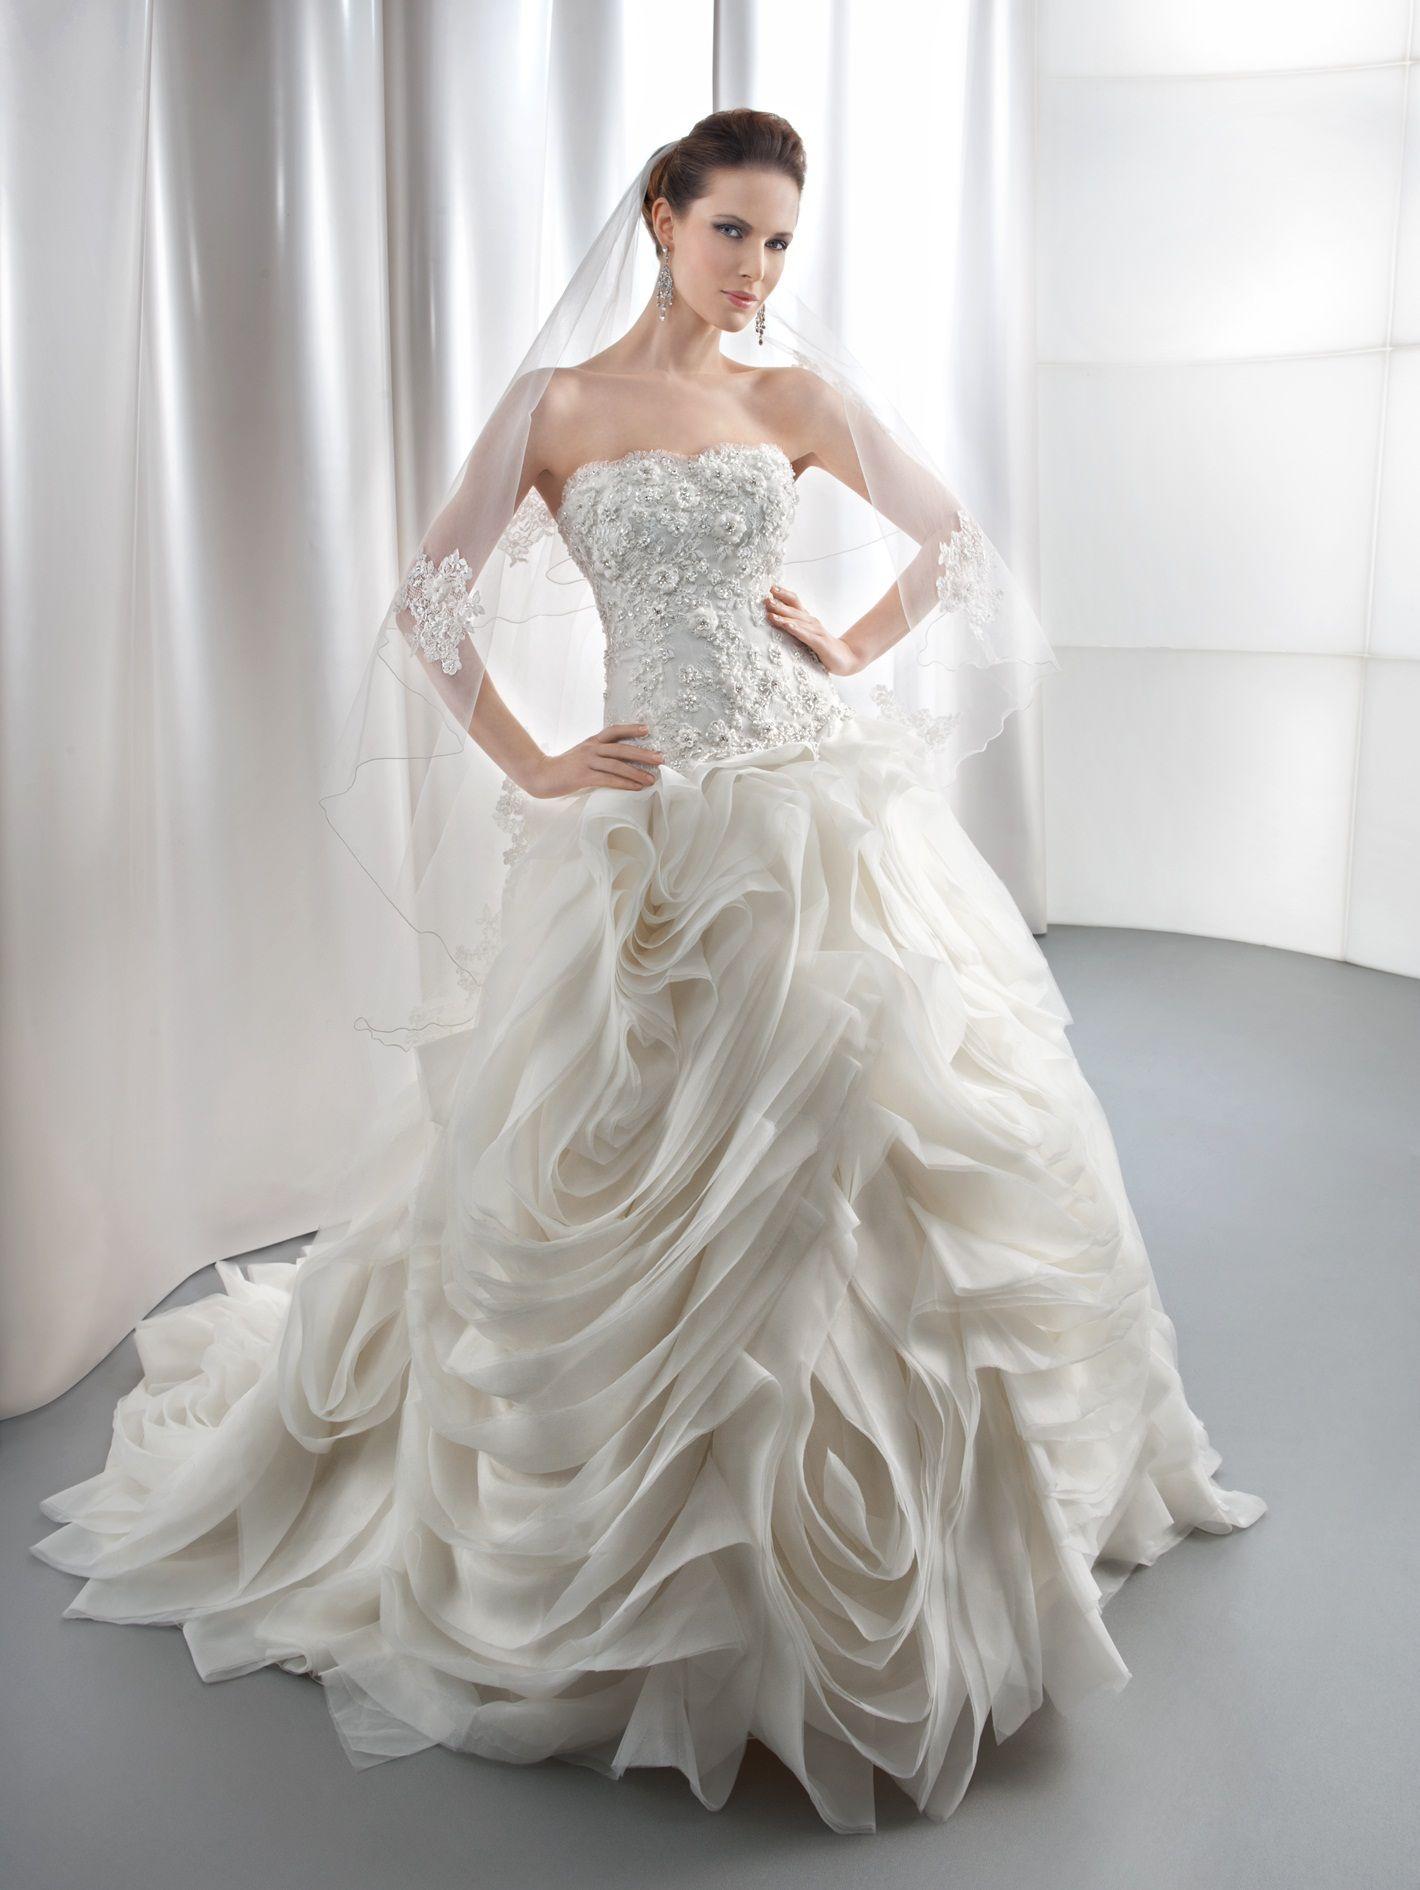 Demetrios Wedding Dresses Prices : Gr gorgeous demetrios wedding gowns dresses